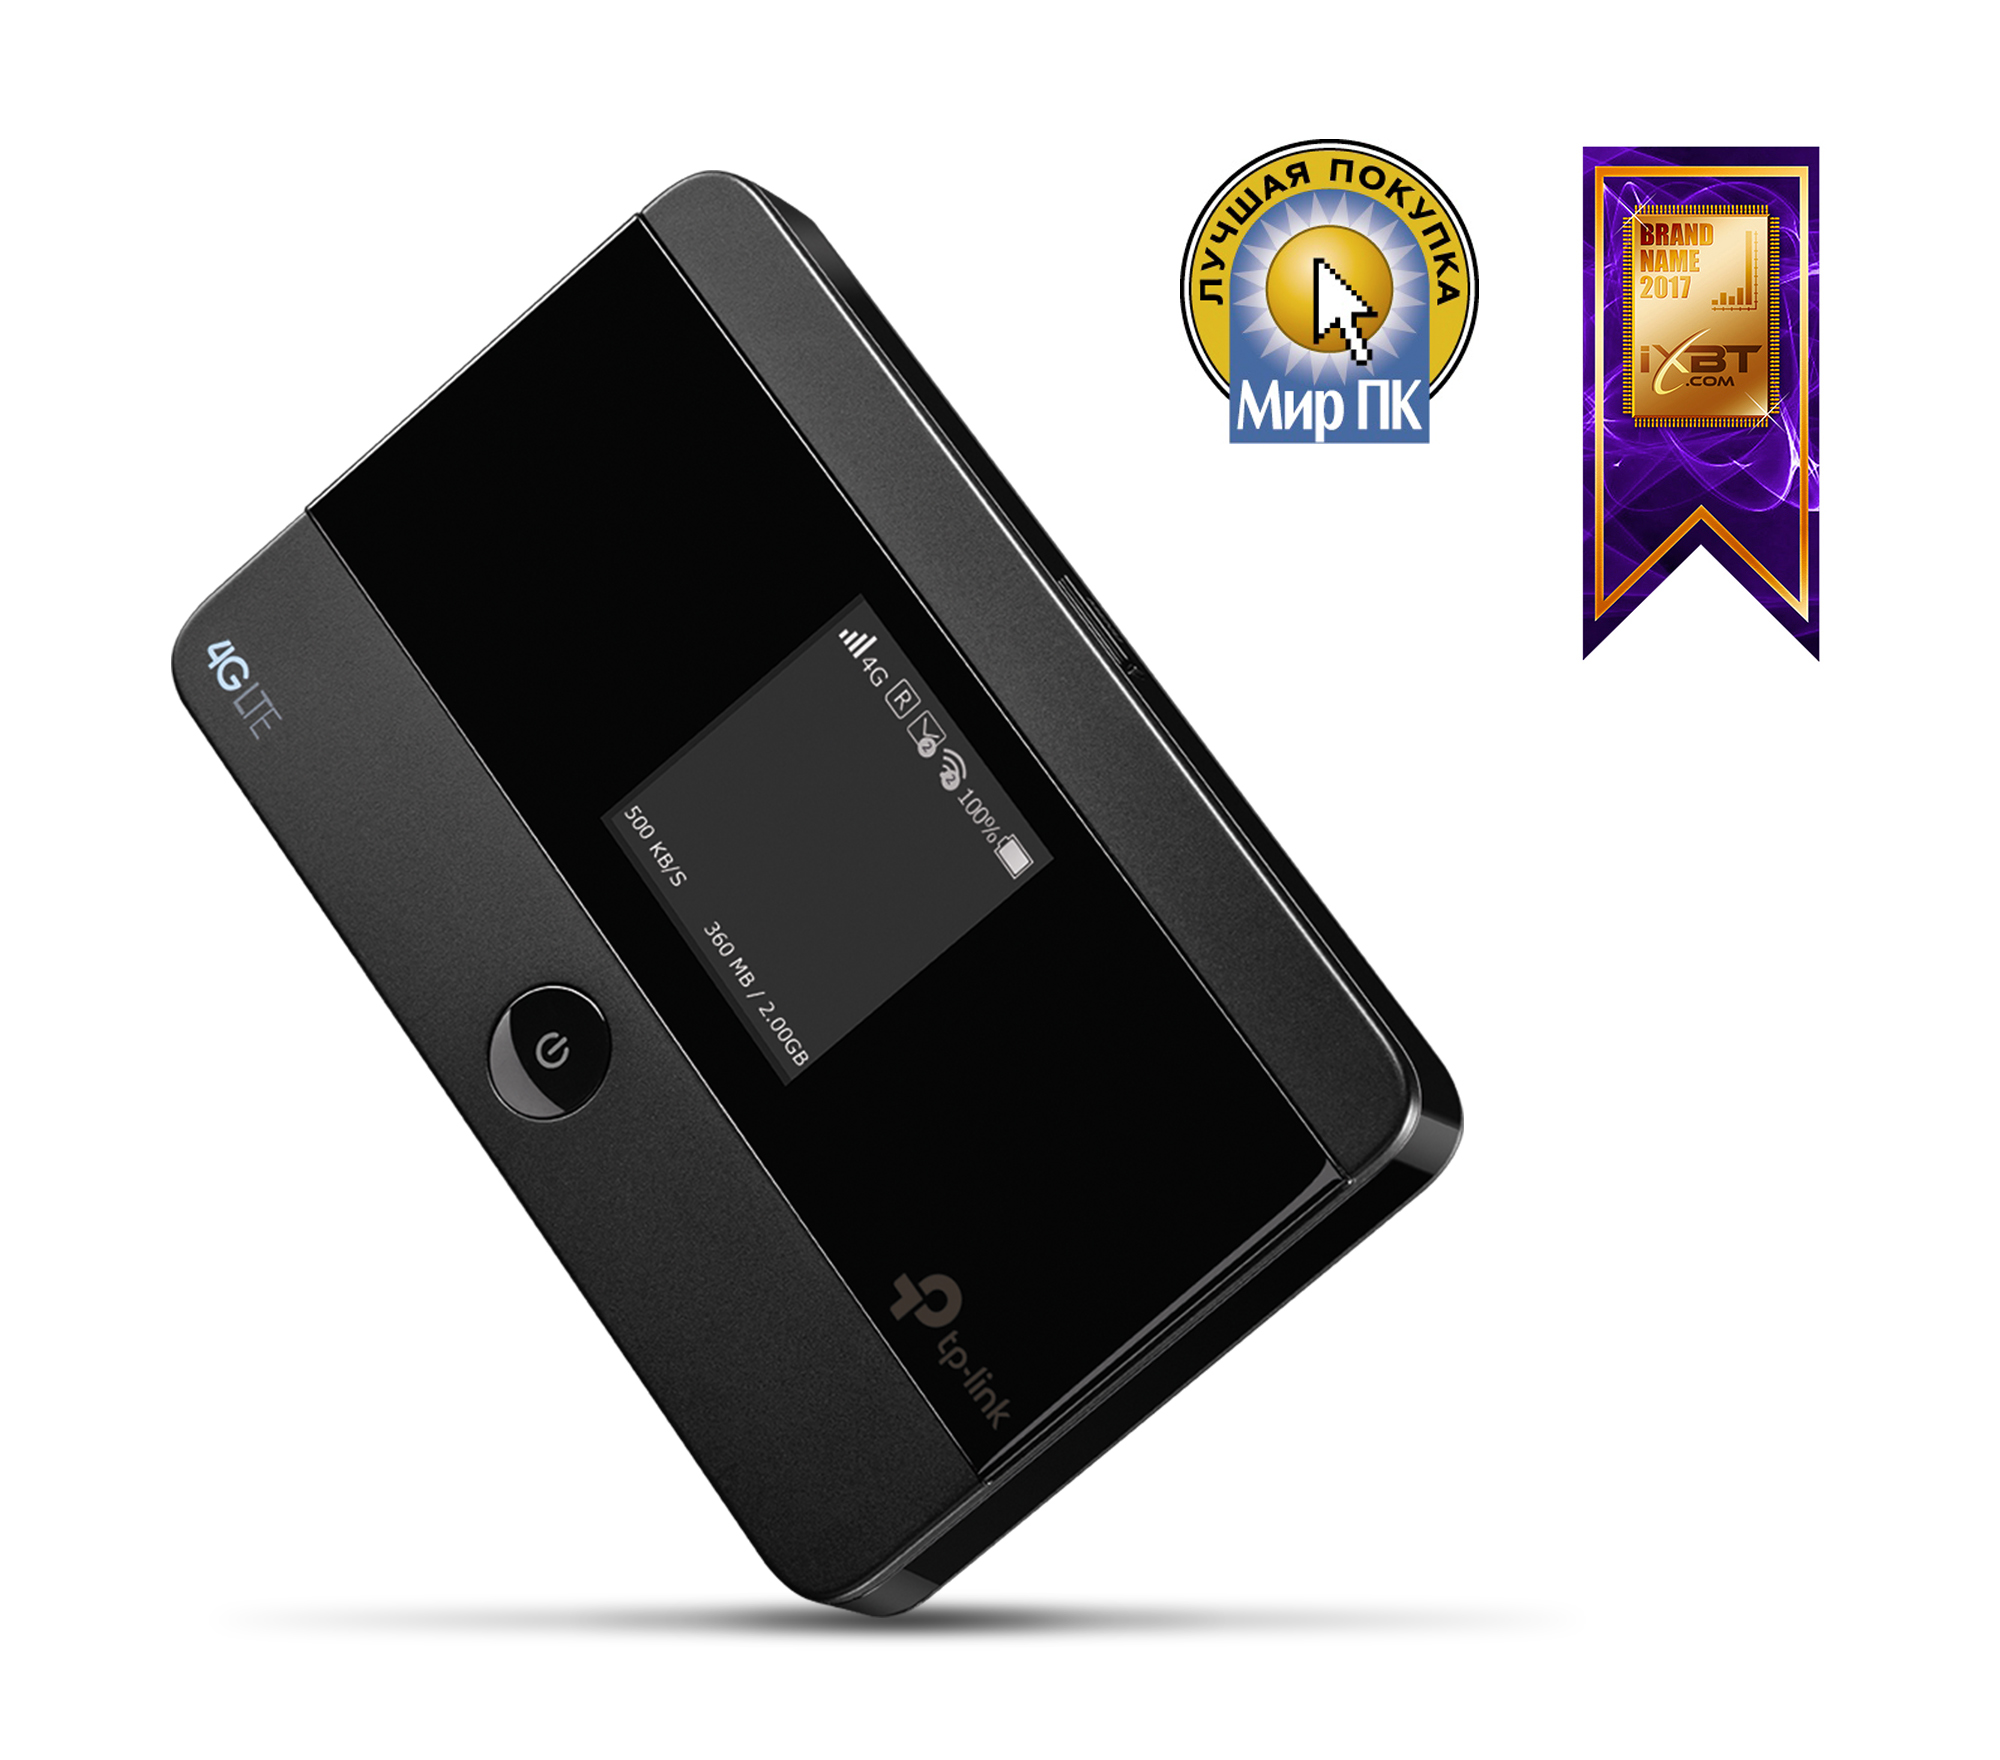 цена на Маршрутизатор TP-LINK M7350 Мобильный беспроводной LTE-Advanced маршрутизатор